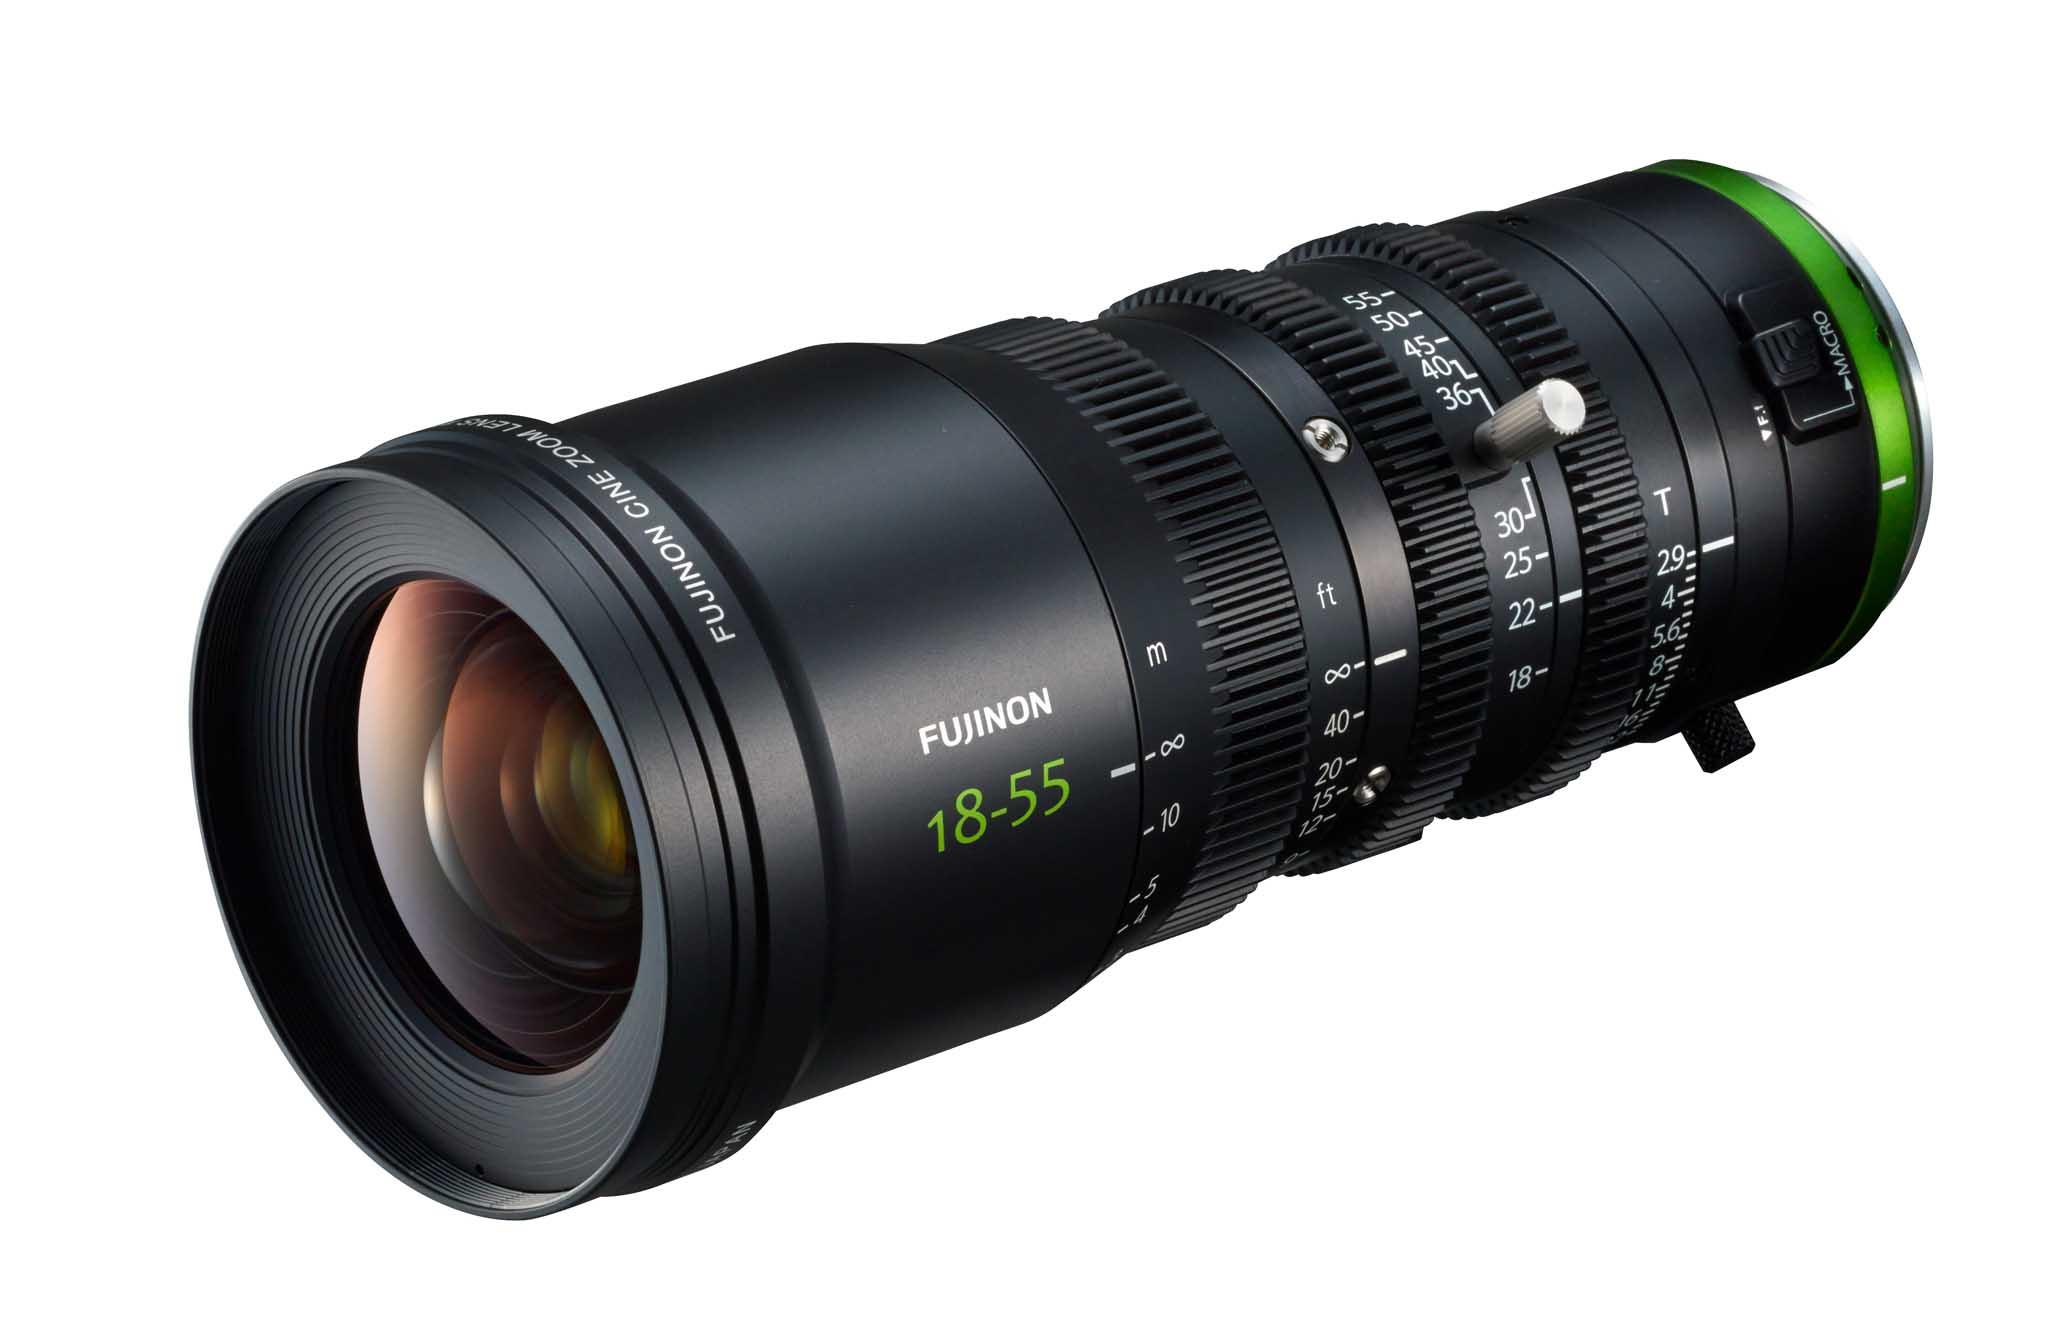 FUJINON MK 1855  50135 T29 Zooms  Film and Digital Times